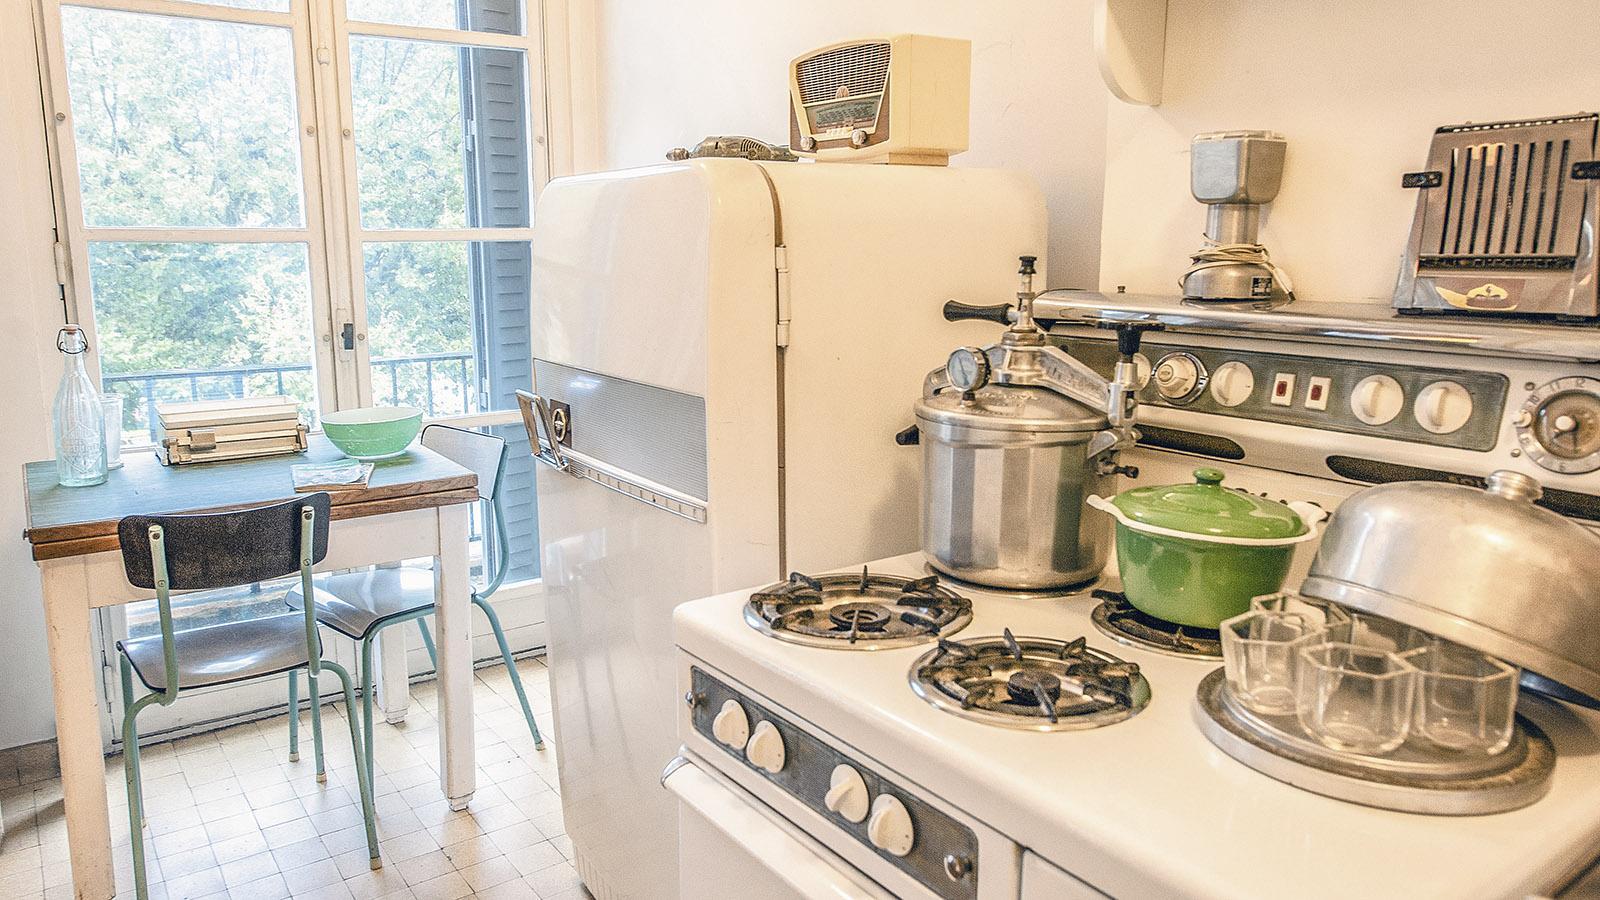 Appartement Témoin: die Küche. Foto: Hilke MaunderFoto: Hilke Maunder